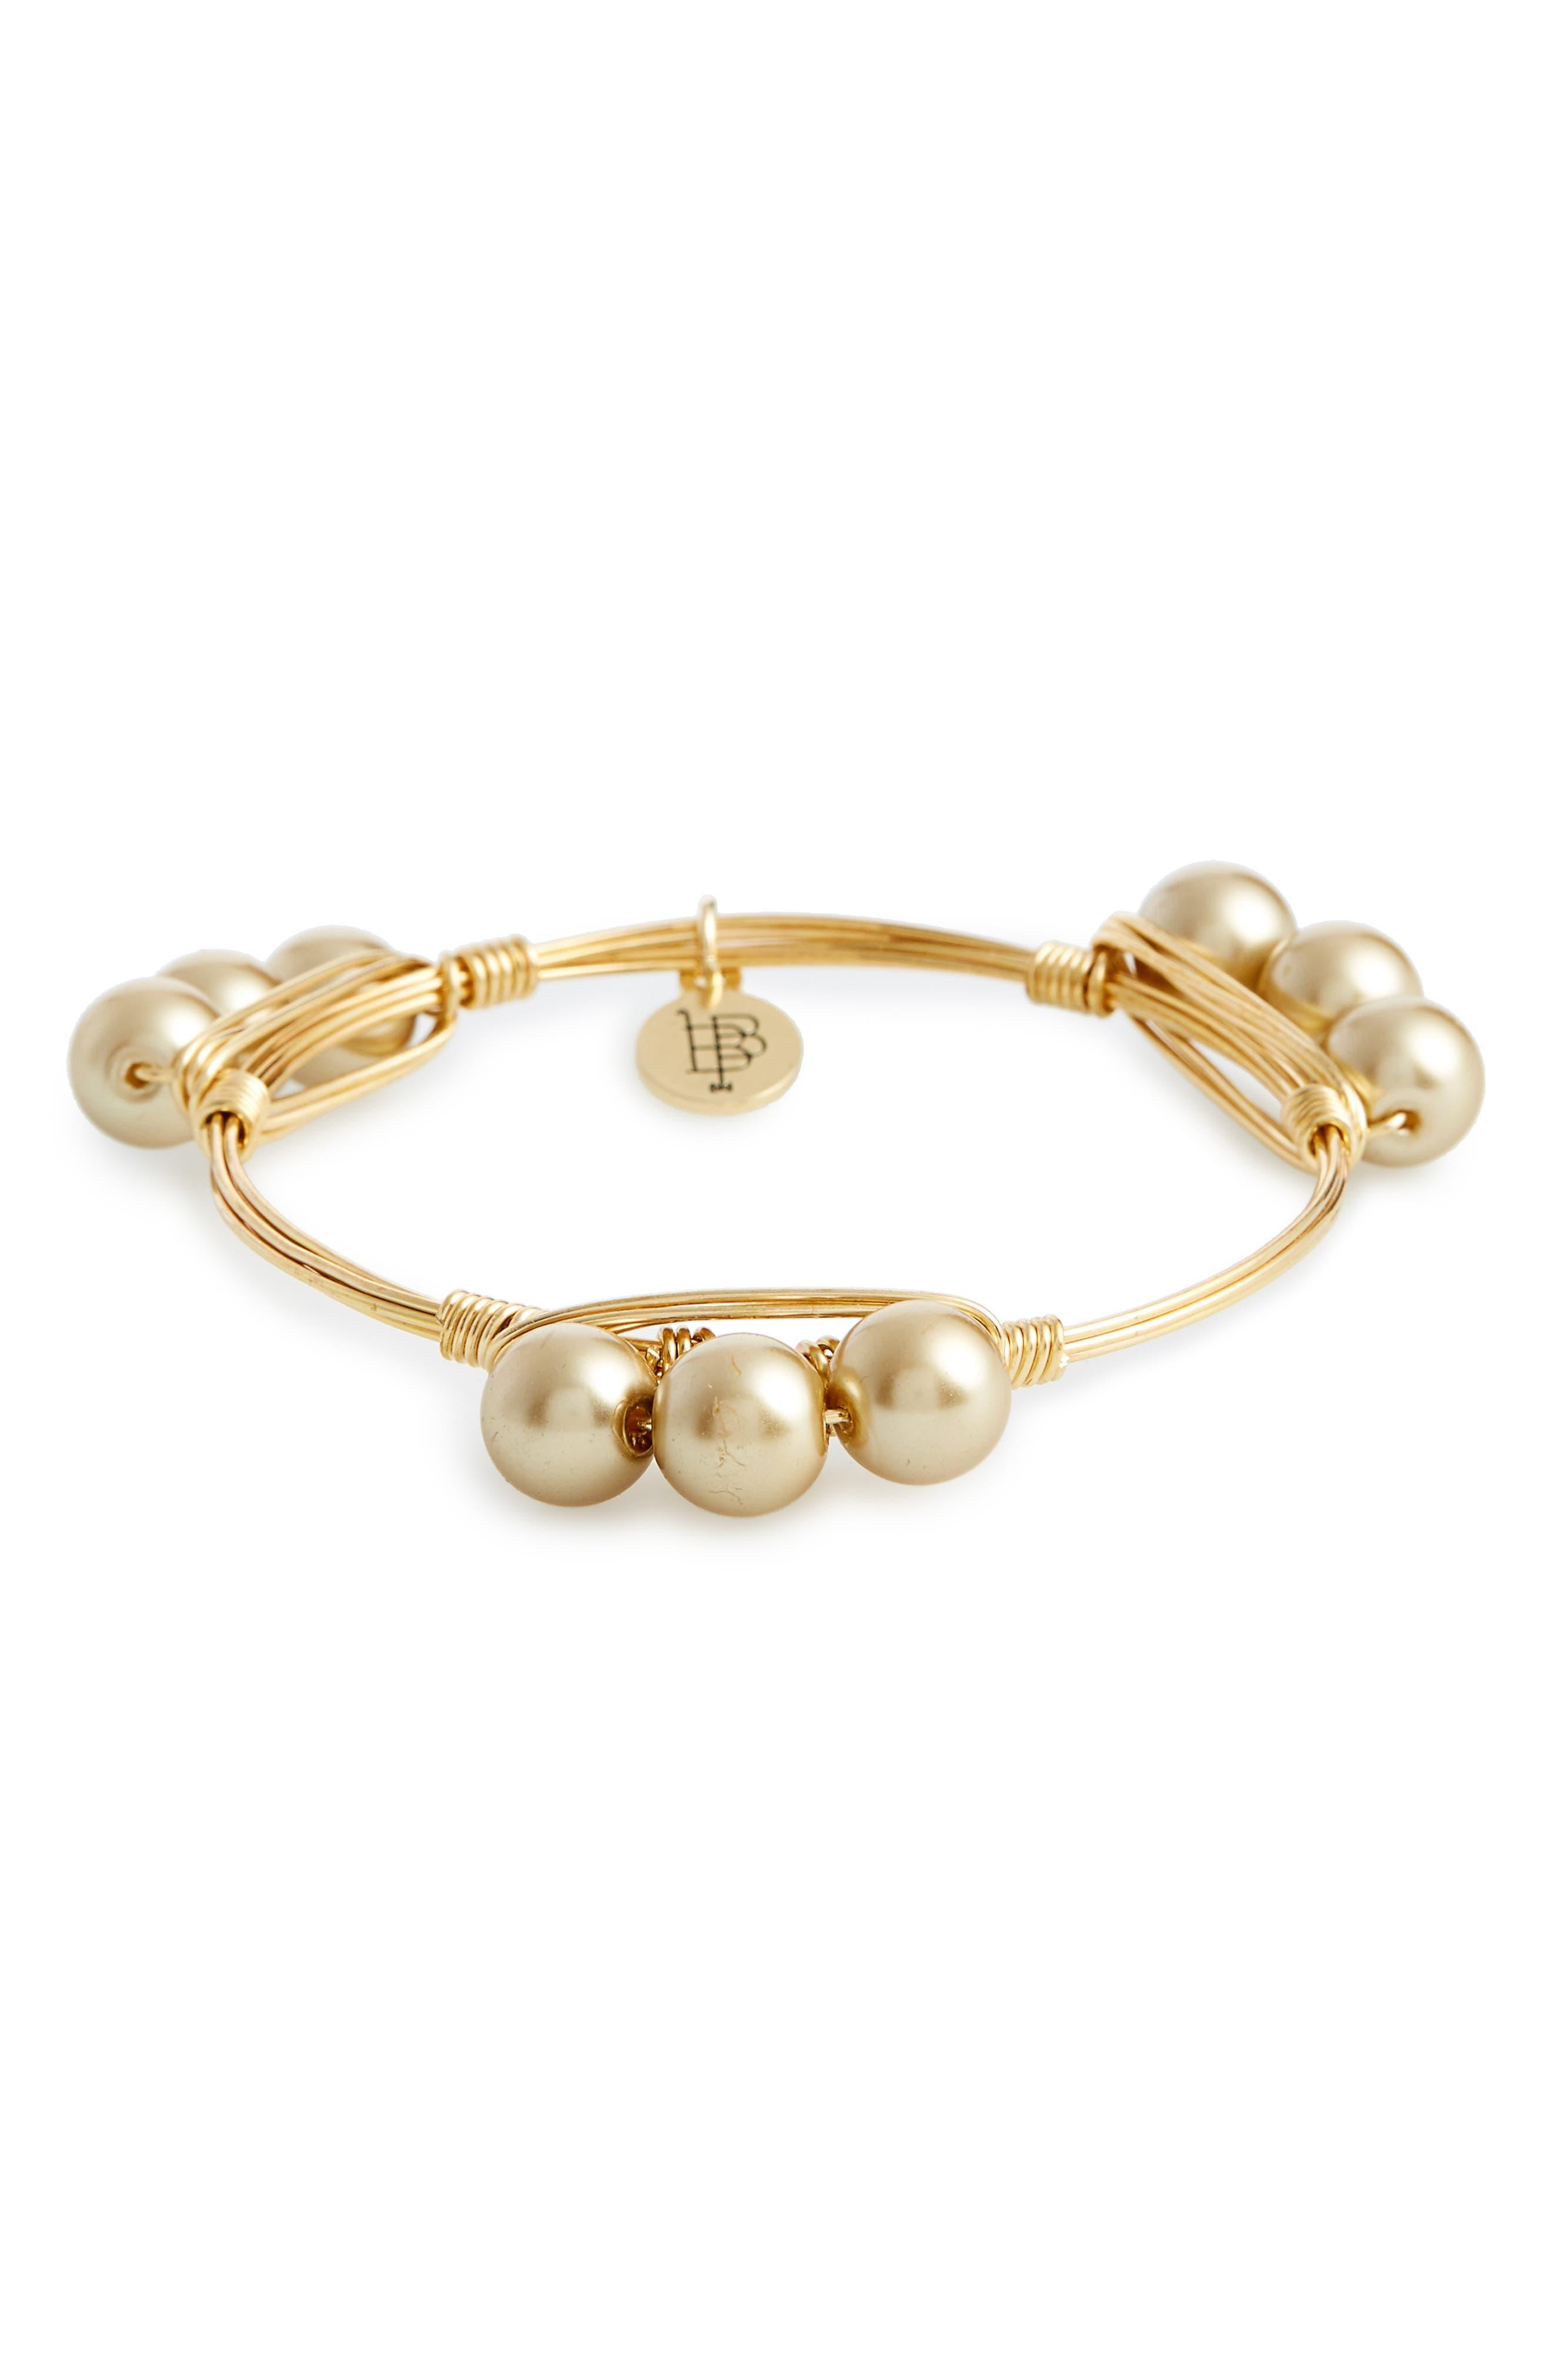 Bourbon and Boweties Imitation Pearl Bracelet